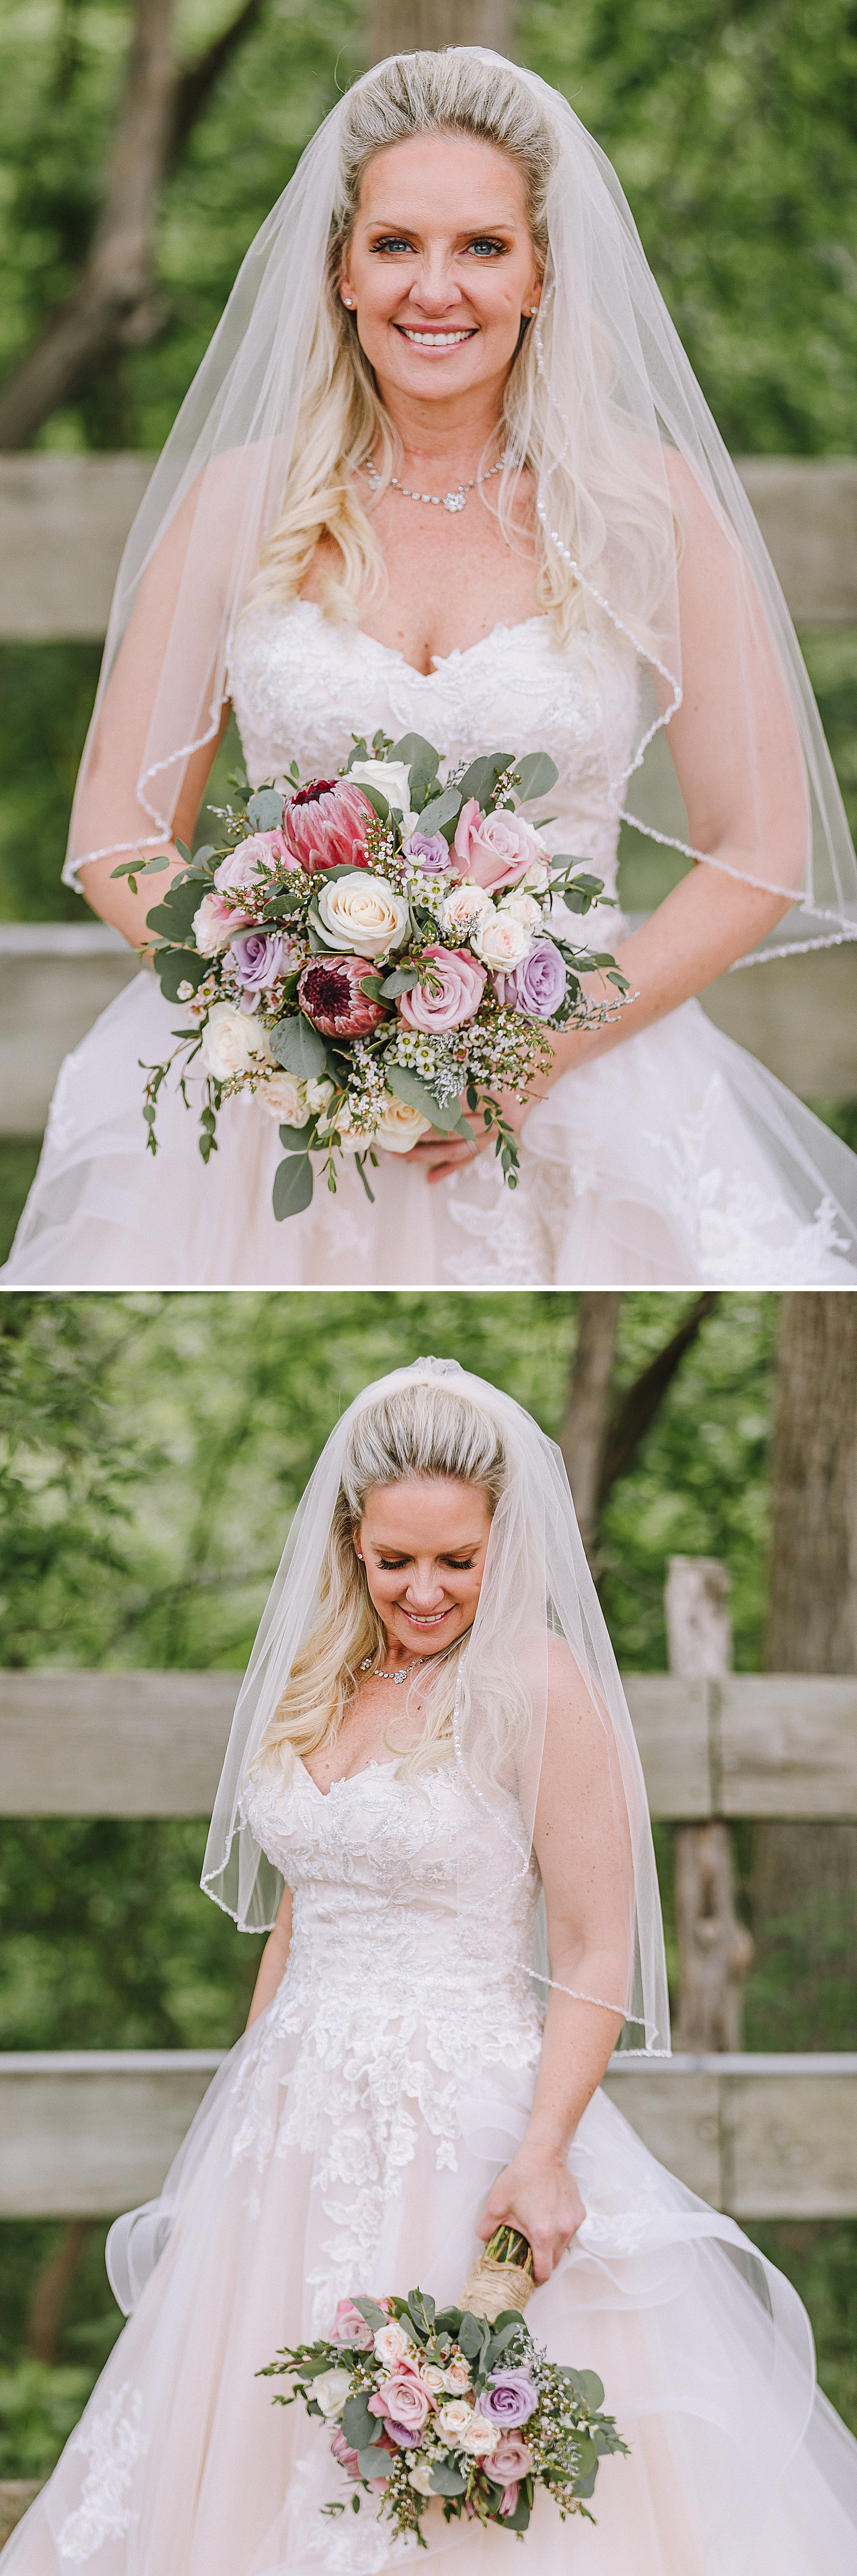 Rio-Cibilo-Ranch-Marion-Texas-Wedding-Rustic-Blush-Rose-Quartz-Details-Carly-Barton-Photography_0029.jpg